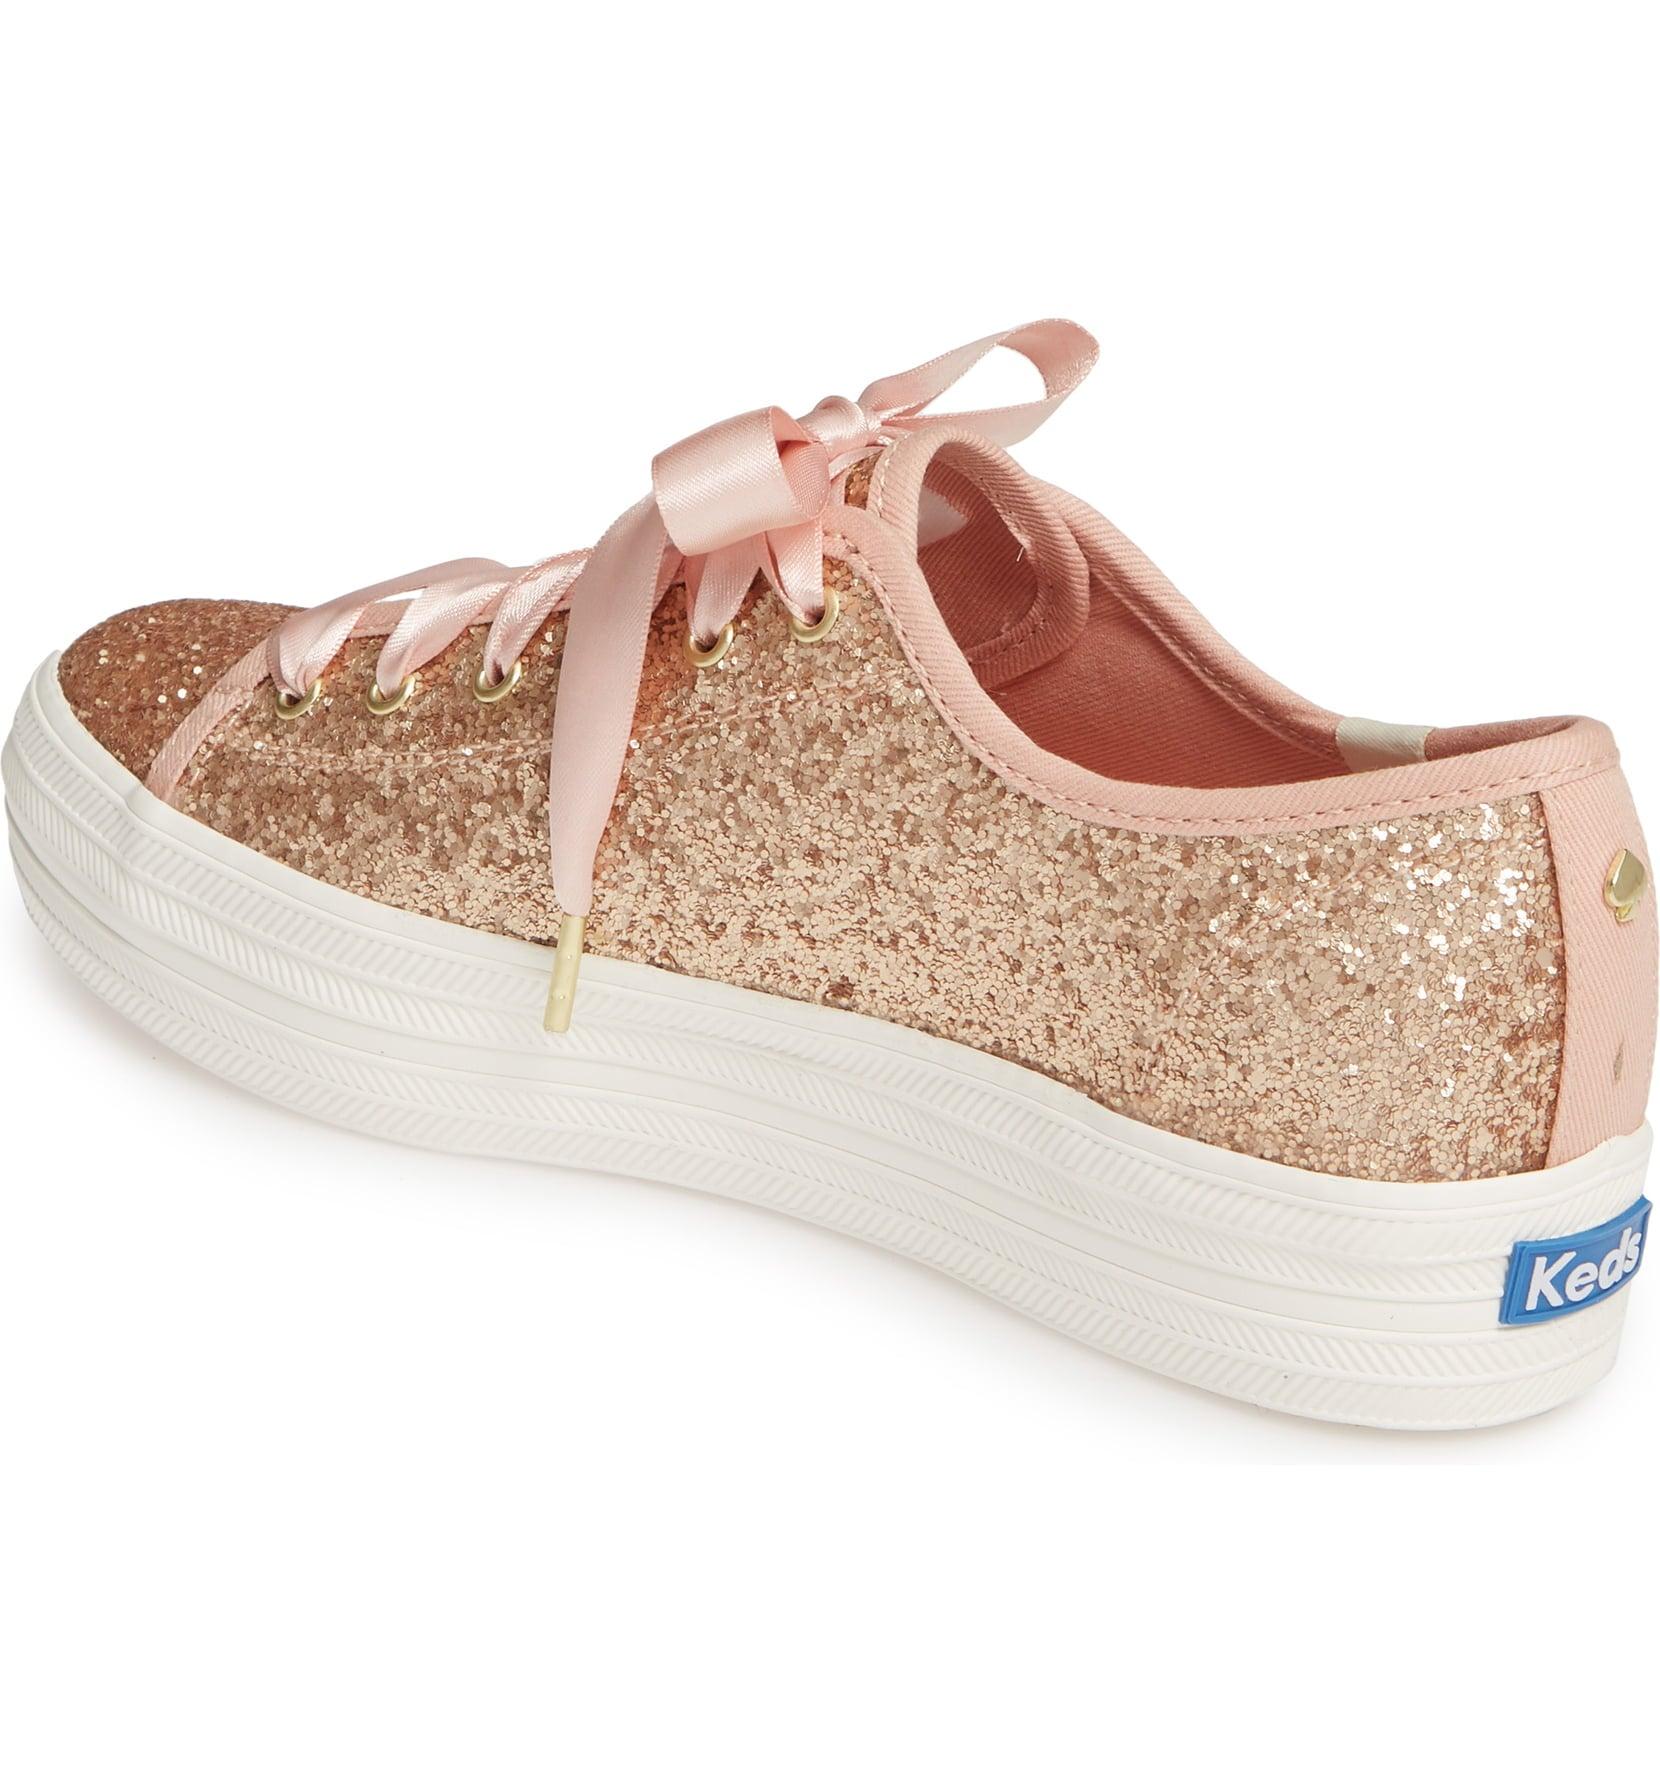 kate spade rose gold sneakers